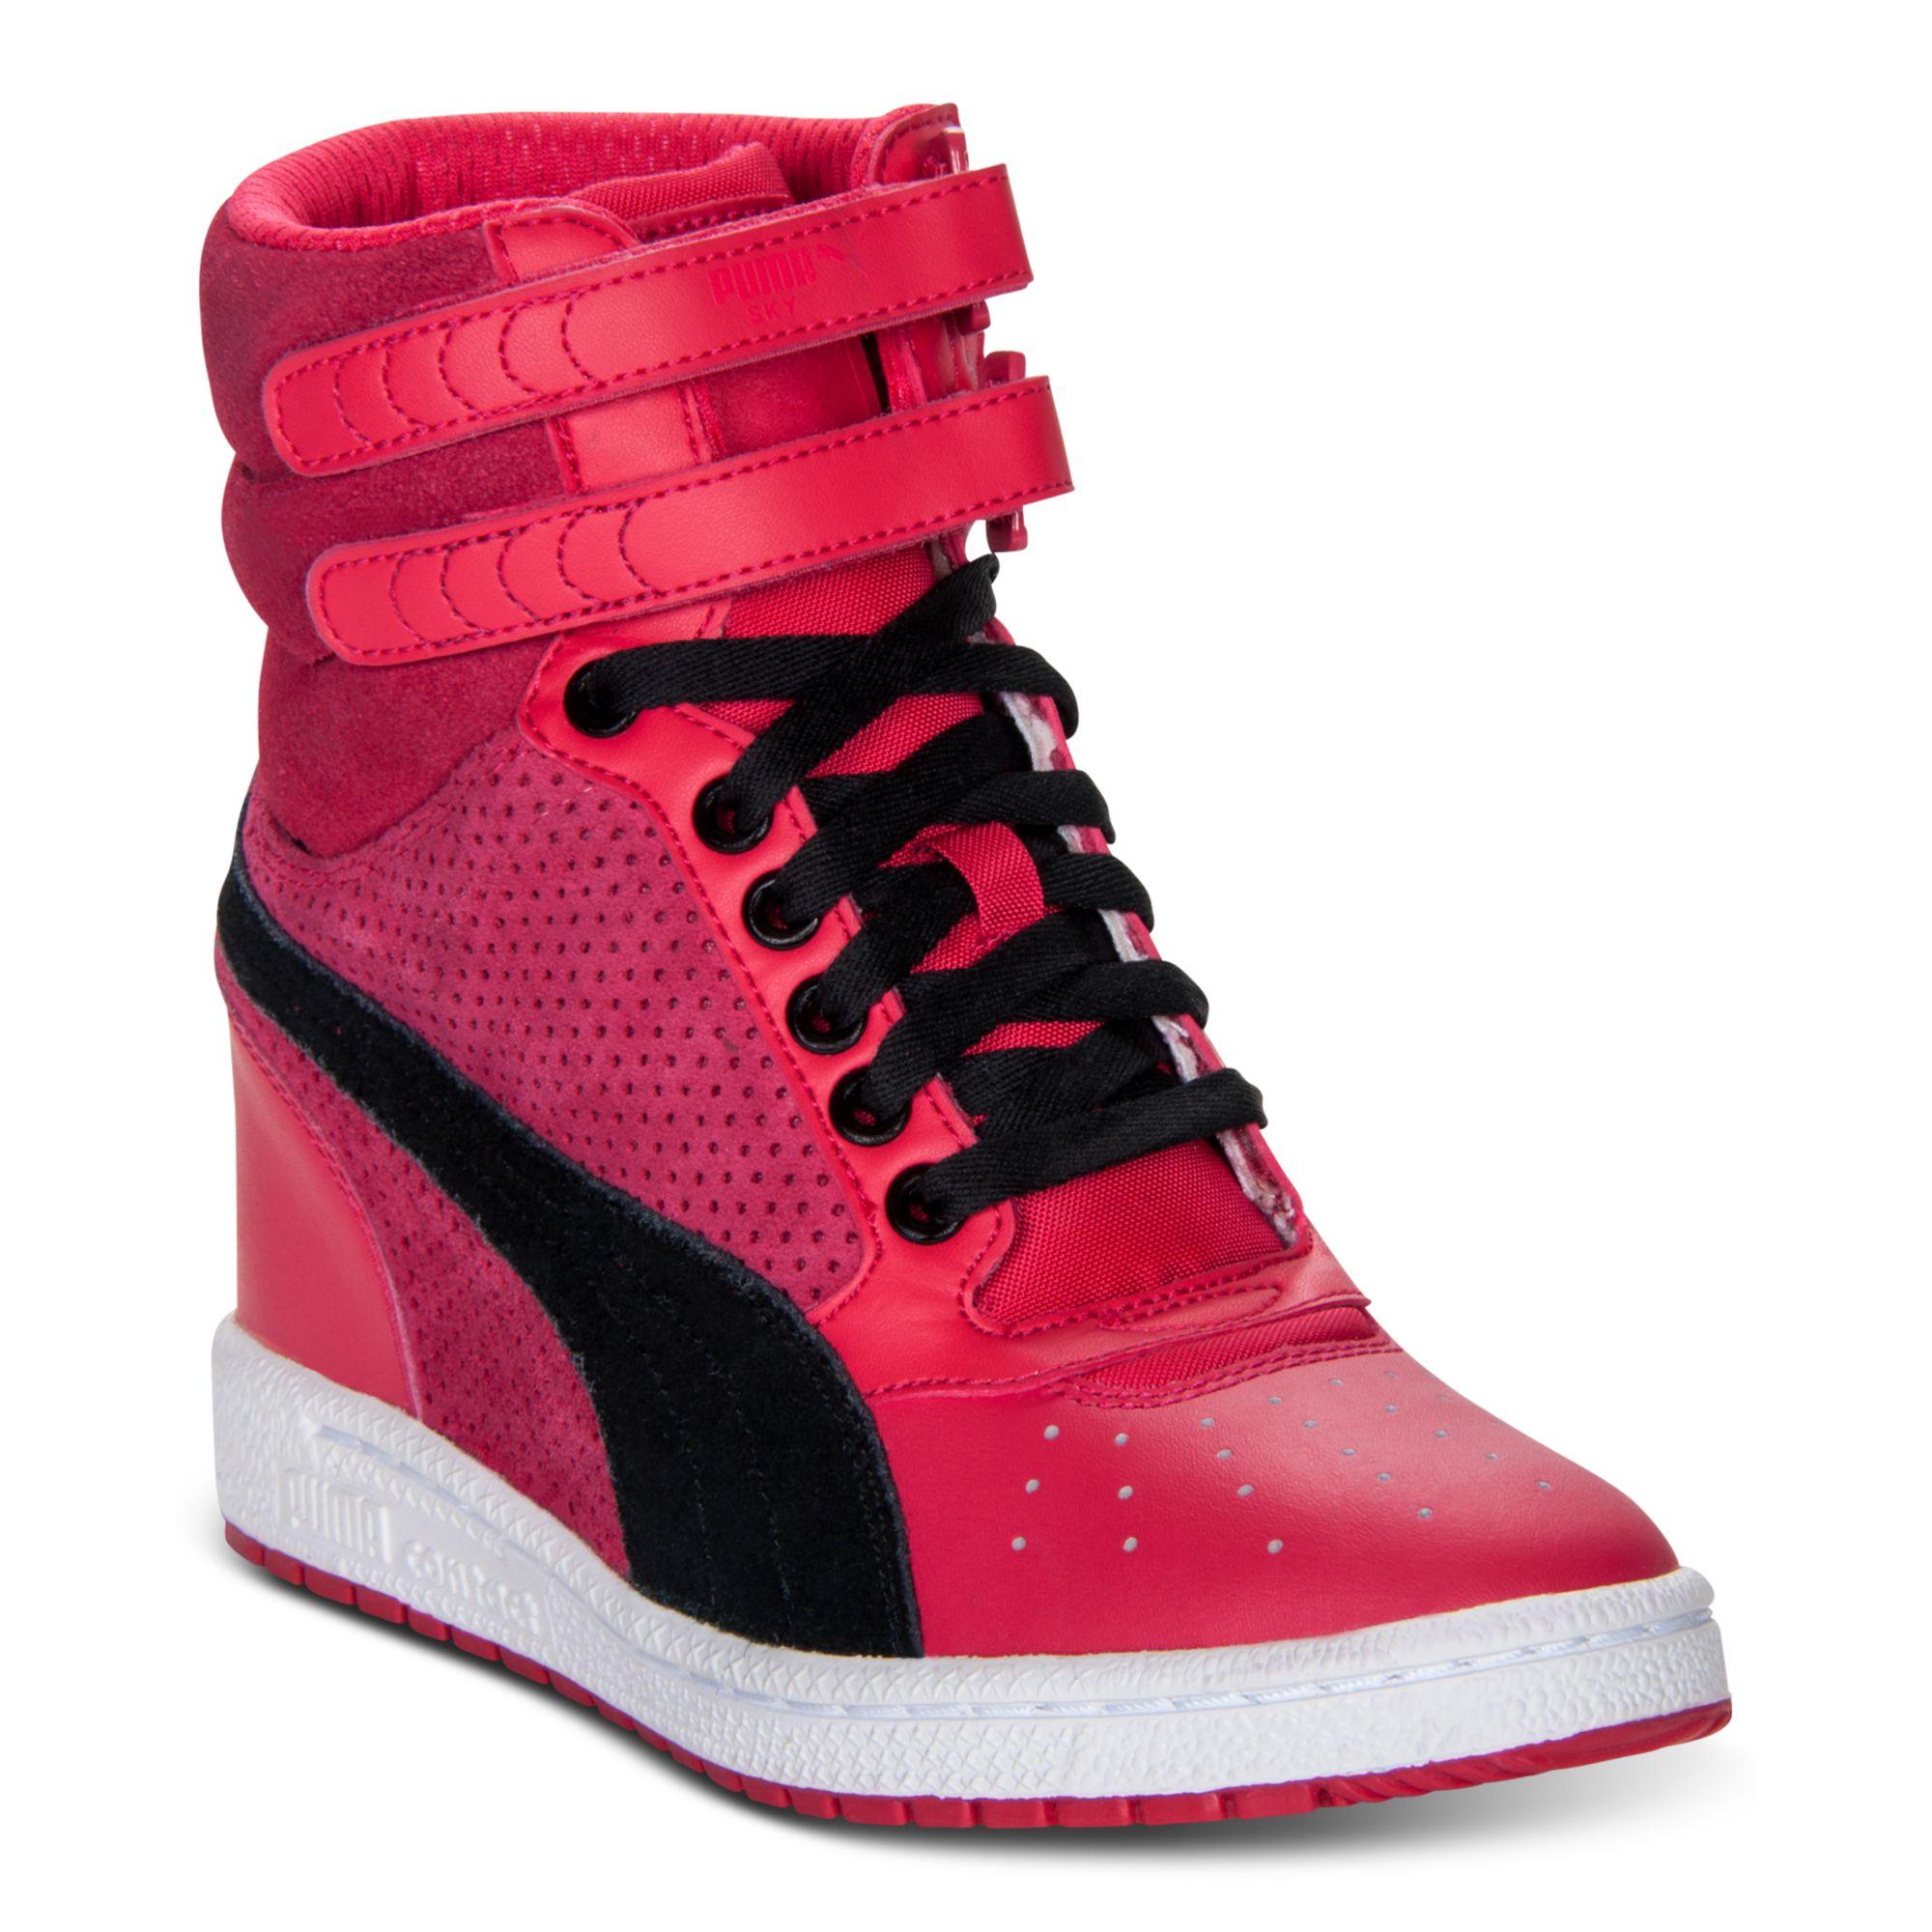 Puma Sky Wedge Casual Sneakers in Pink (VIRTUAL PINK)  70cbe5617